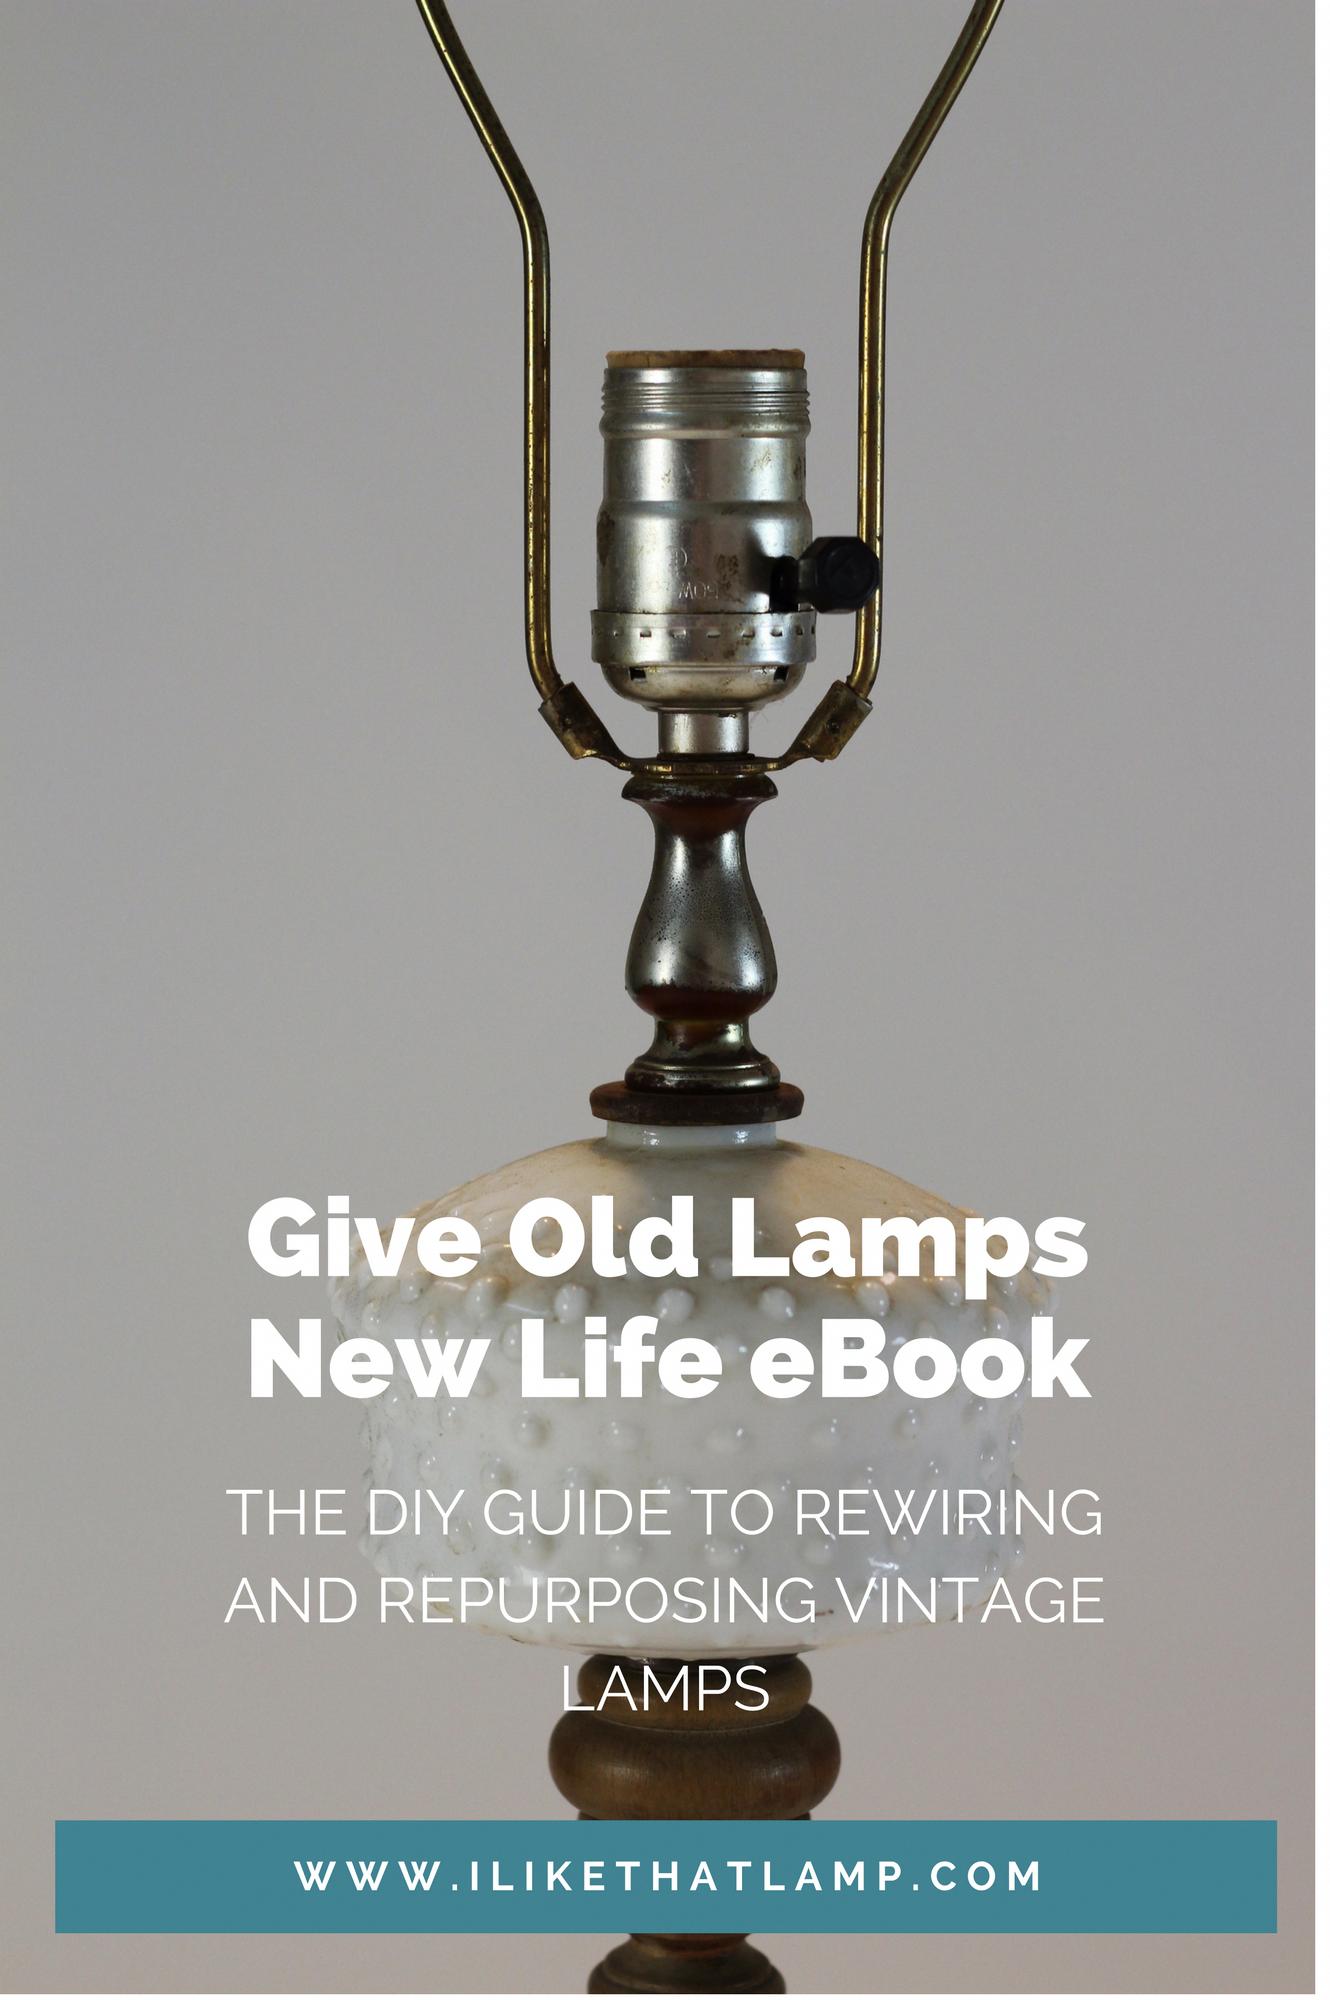 5aeca82d57a3930fc7d642f79f494995 how to rewire old lamps and repurpose vintage lamps, full diy guide